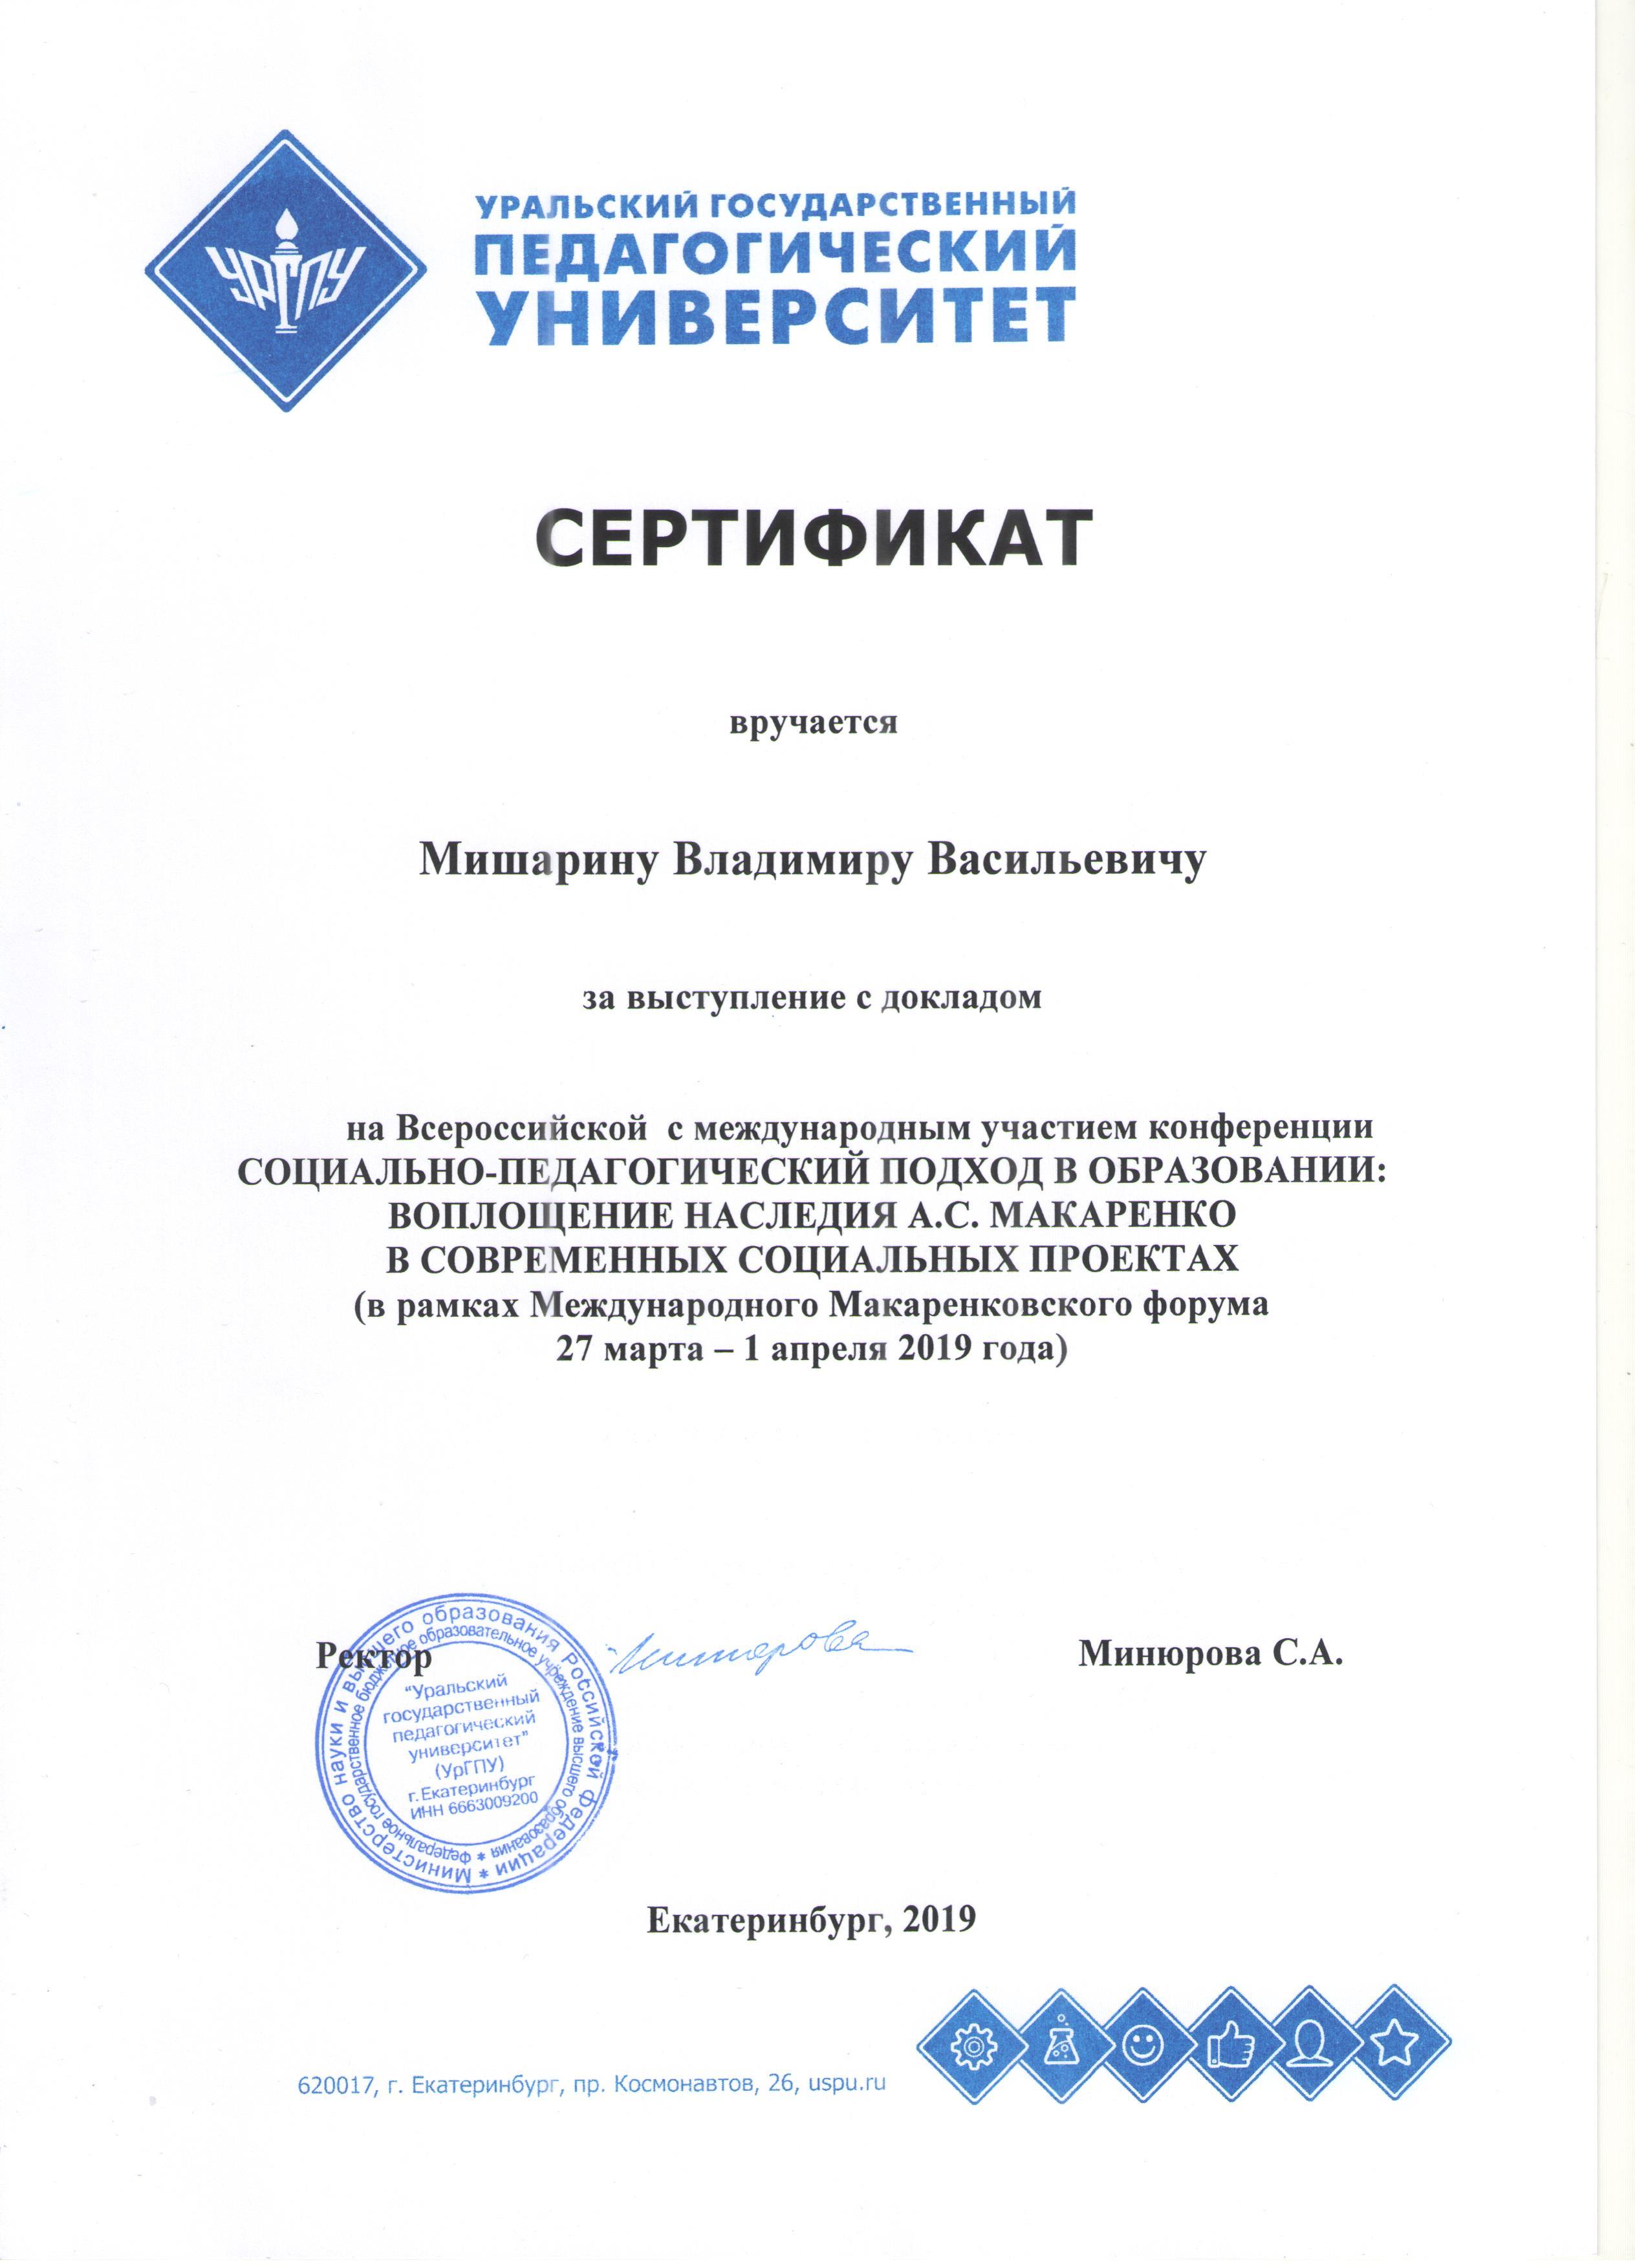 Сертификат участника конференцииУГПУ